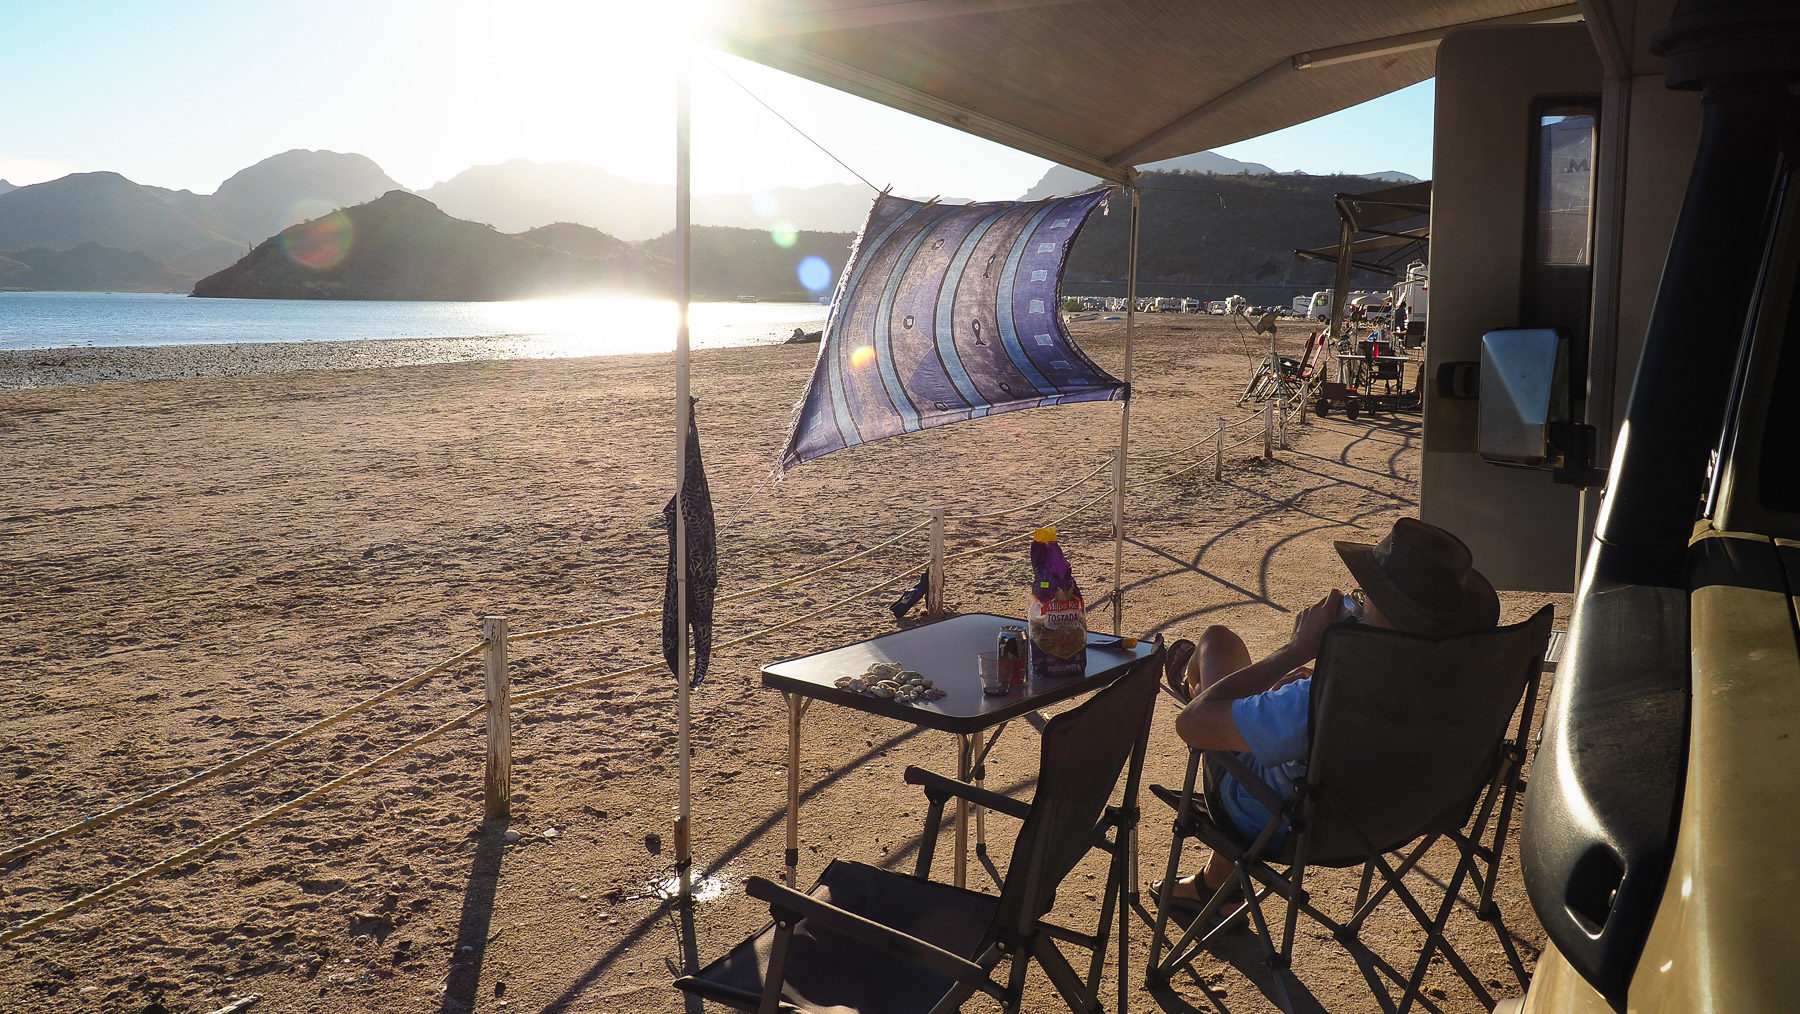 Schöne Tage an der Plaja Santispac